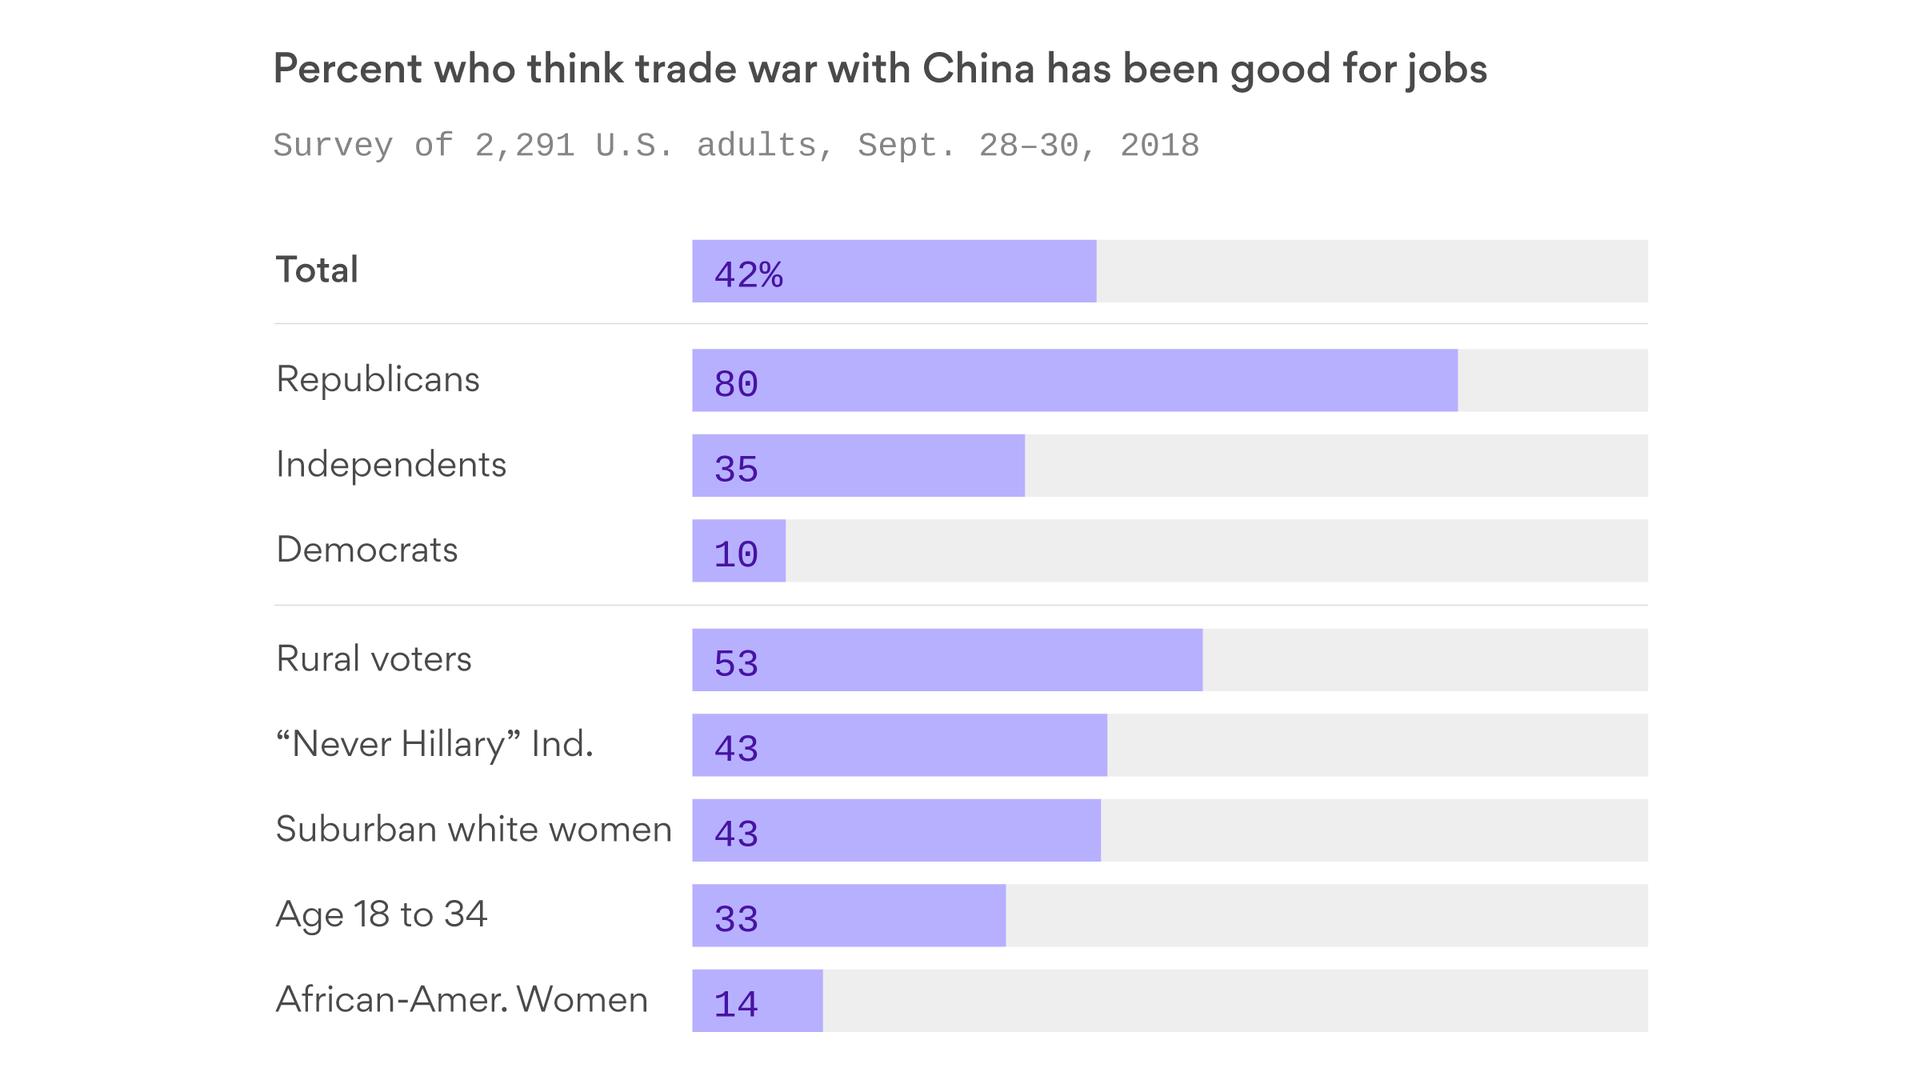 https://www.axios.com/trump-china-tariff-trade-poll-eed15df0-b7b0-404c-965d-10c7ab1ded2c.html